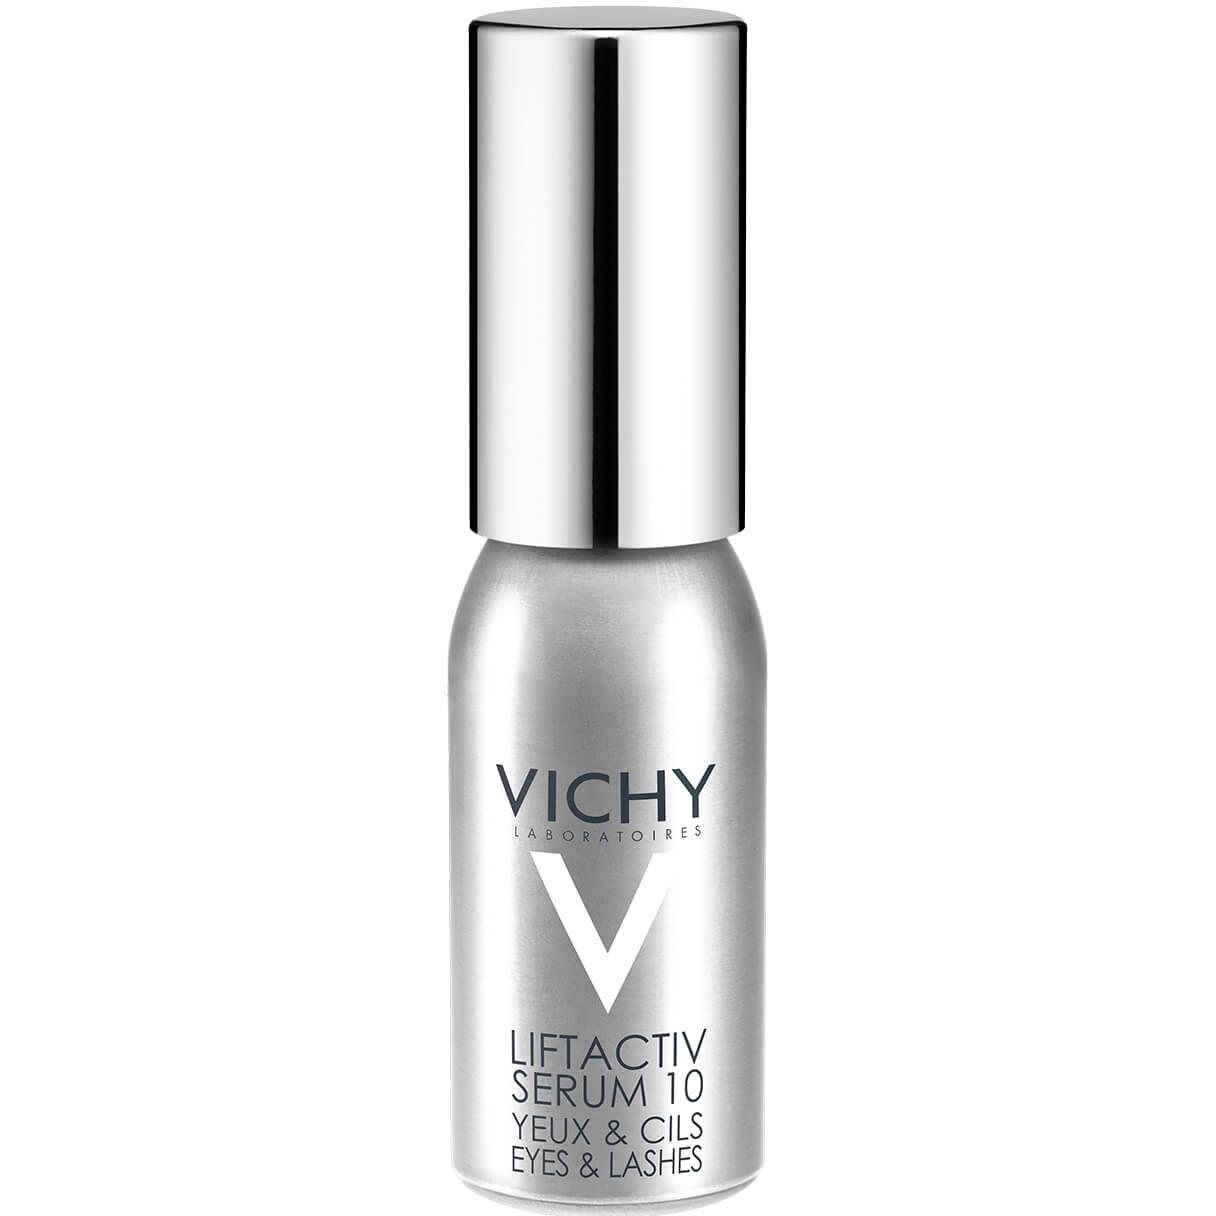 Vichy Liftactiv Derm Source Serum 10 Ορός για τα Μάτια και τις Βλεφαρίδες για Αποτέλεσμα Lifting και Νεανικό Βλέμμα 15ml